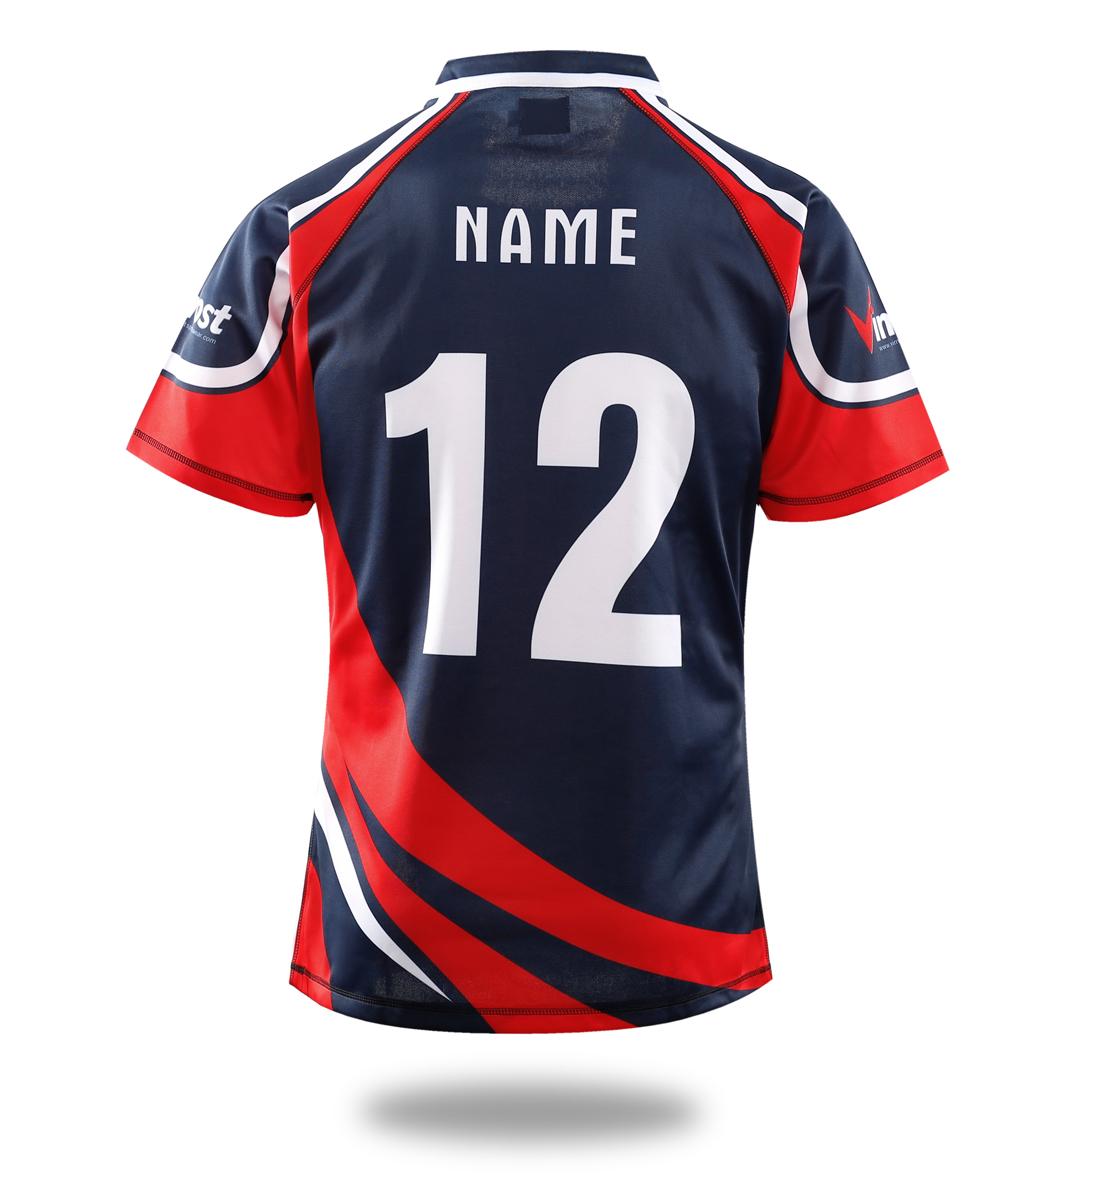 5d8edddeee6 Red Black Rugby Shirts - DREAMWORKS